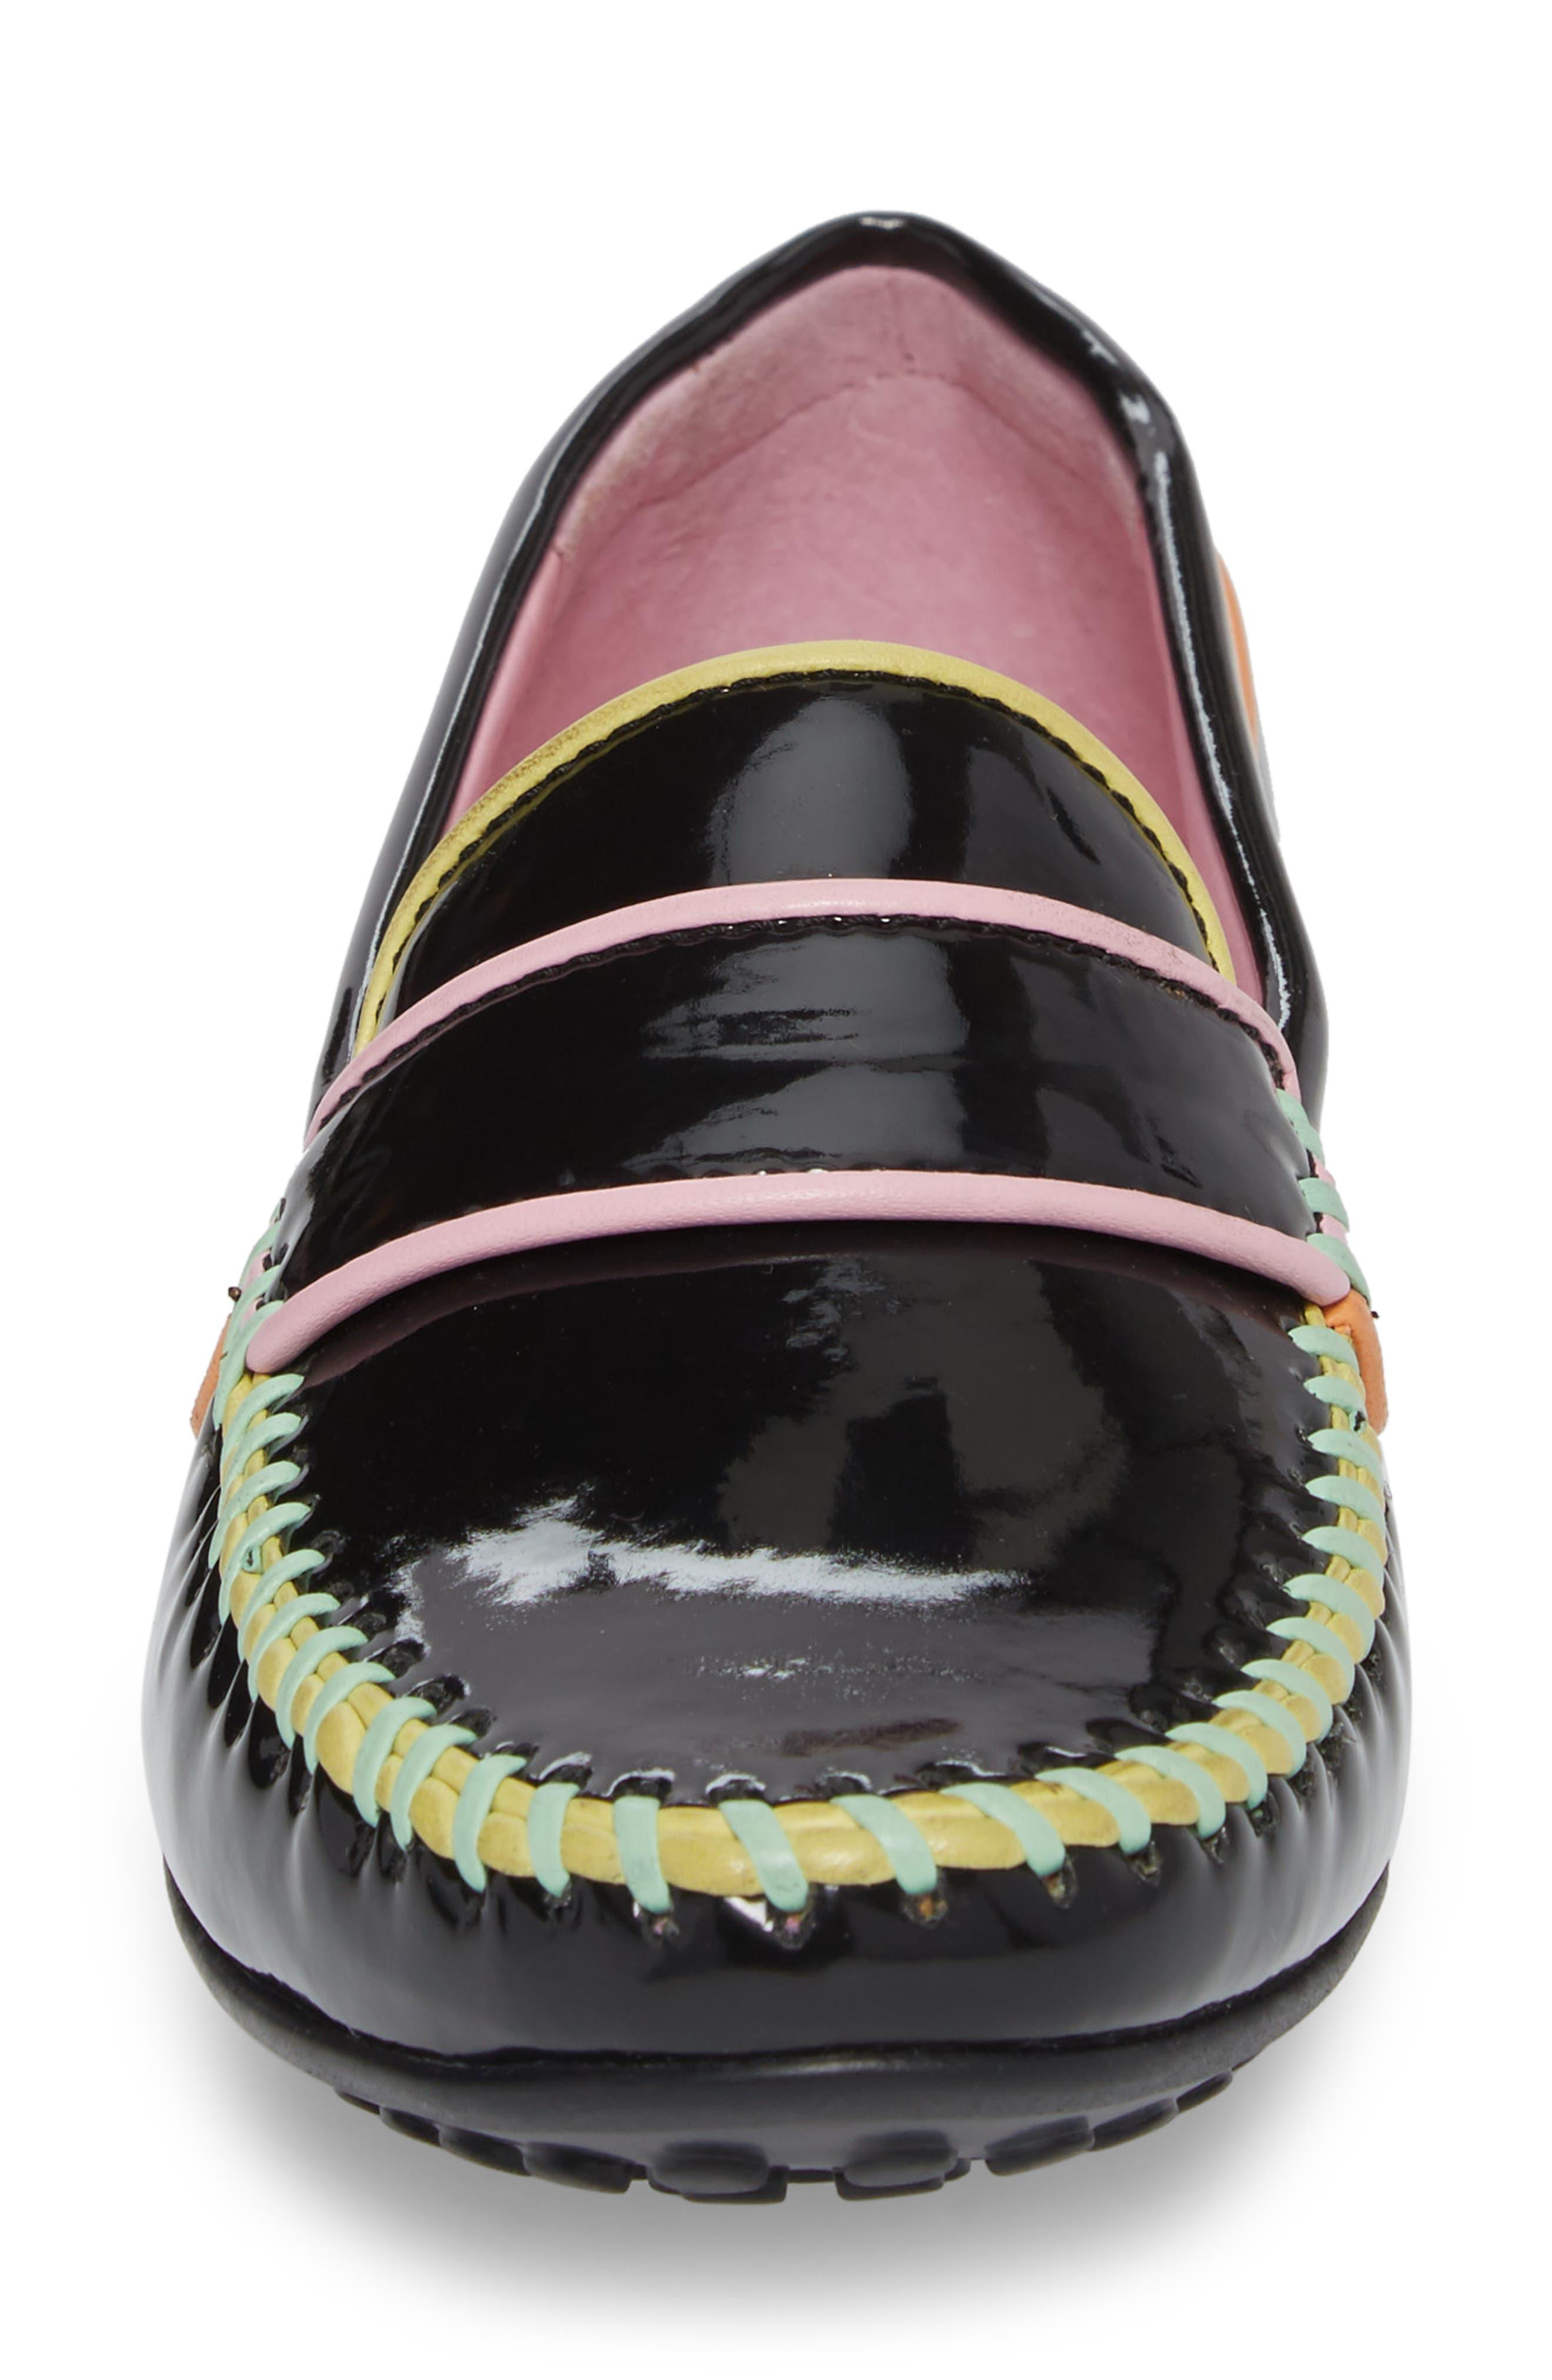 Moccasin Loafer,                             Alternate thumbnail 4, color,                             Black/ Black Patent